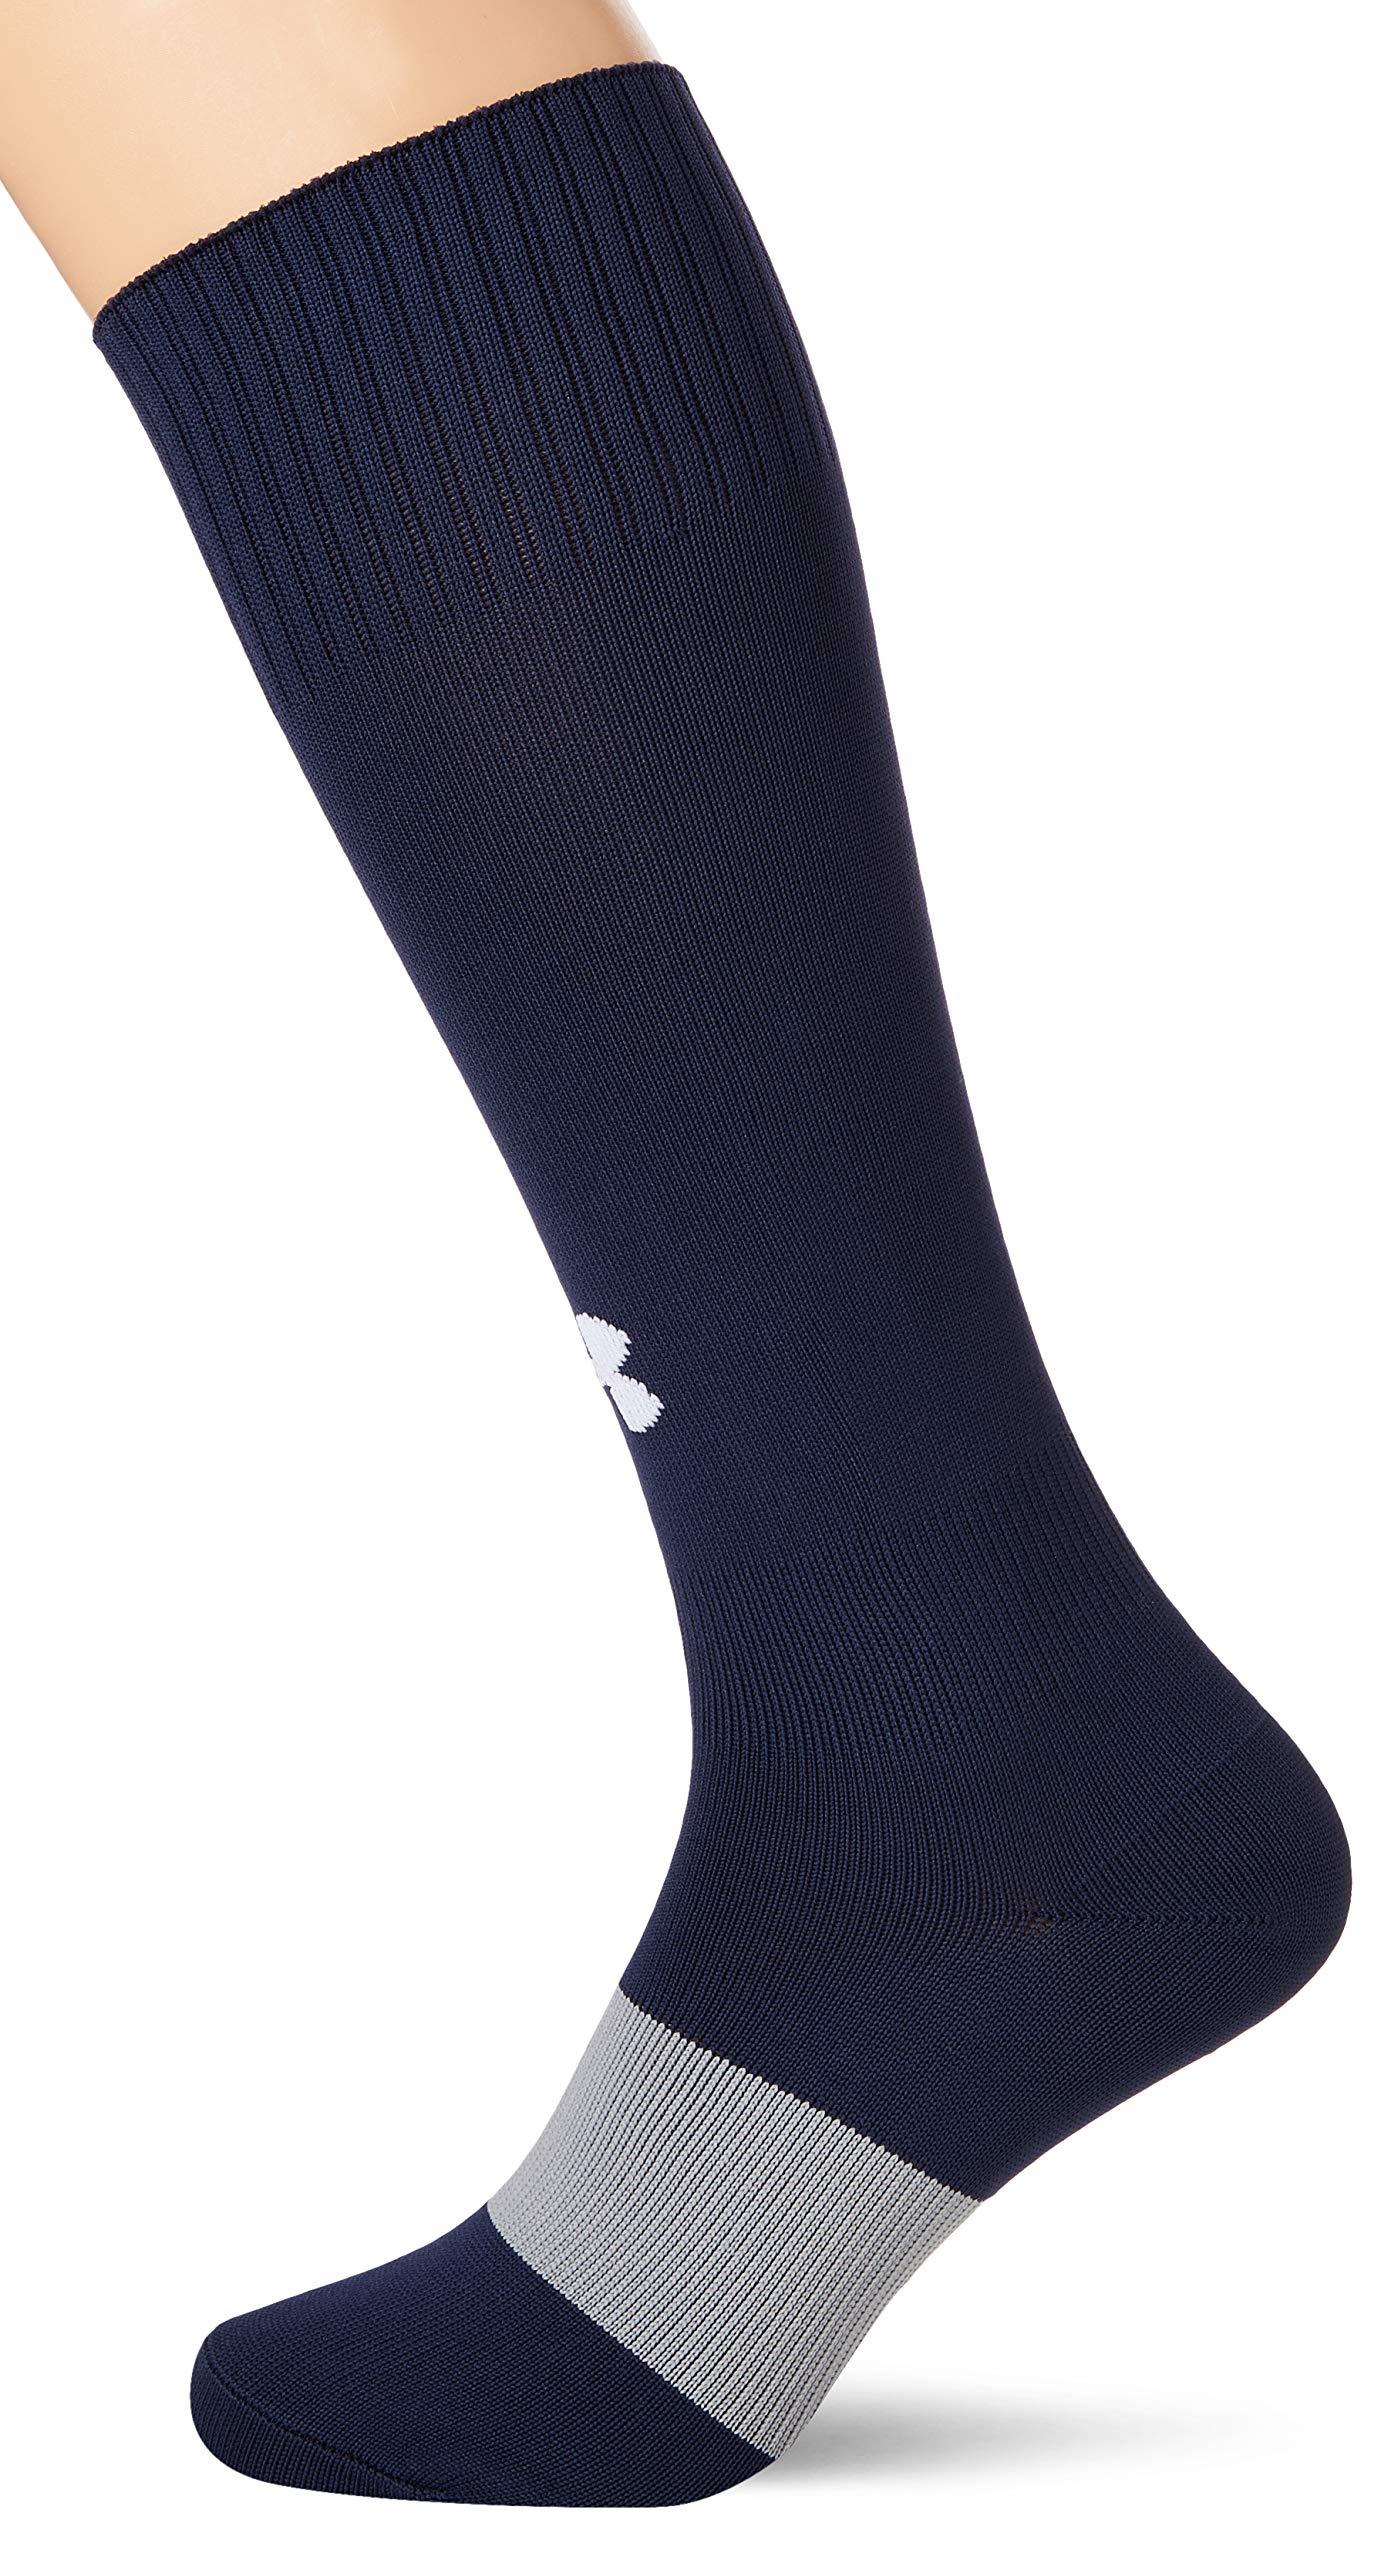 Under Armour Unisex Ua Soccer Solid Otc Sport Socken, Navyblau (Midnight Navy/Wh